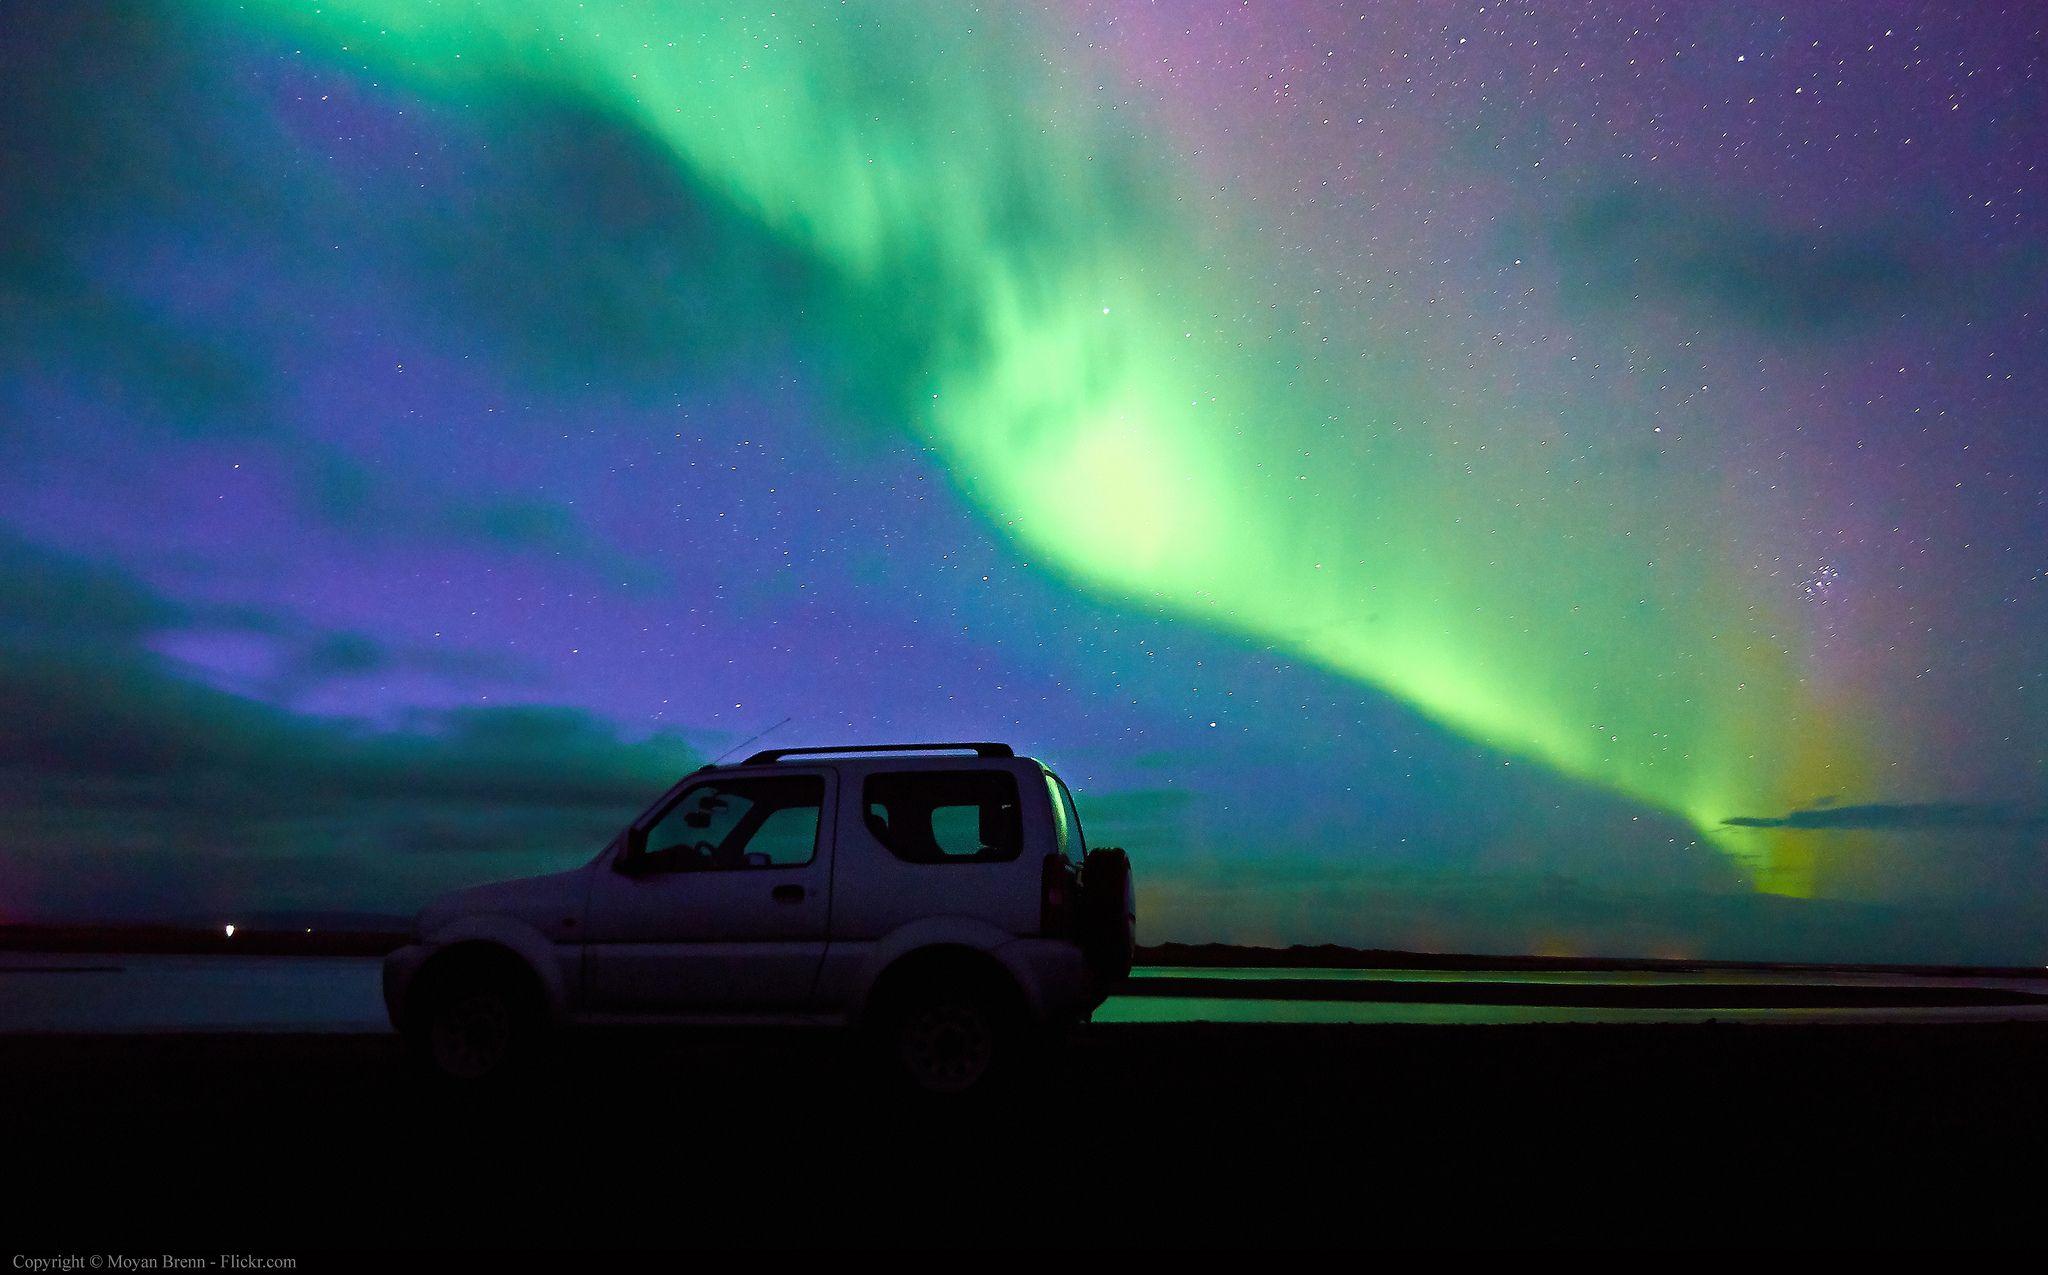 Aurora Borealis | Flickr - Photo Sharing!